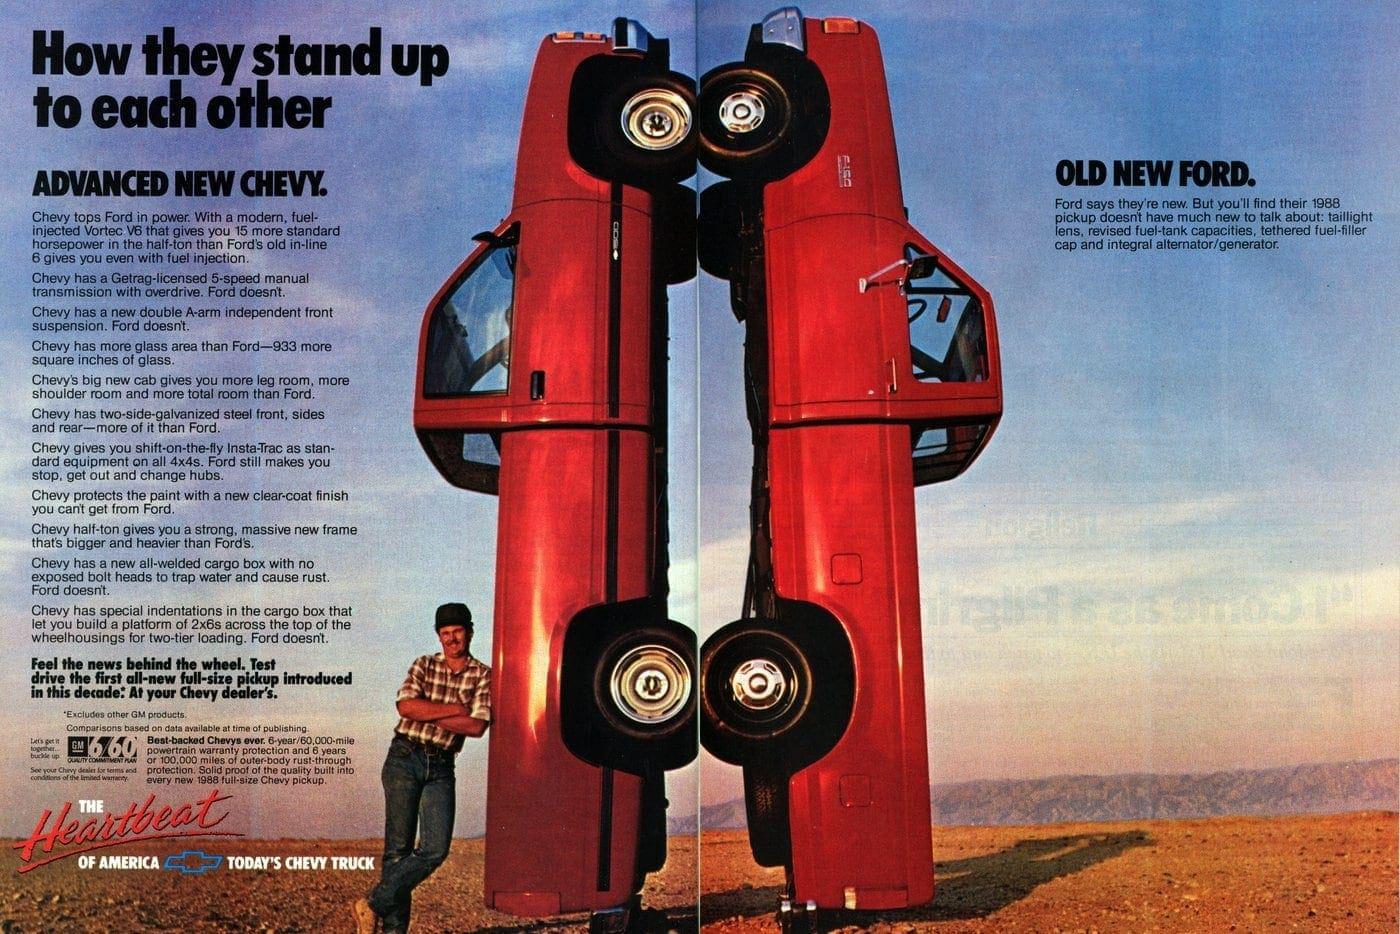 Chevy vs Ford pickup trucks (1987)